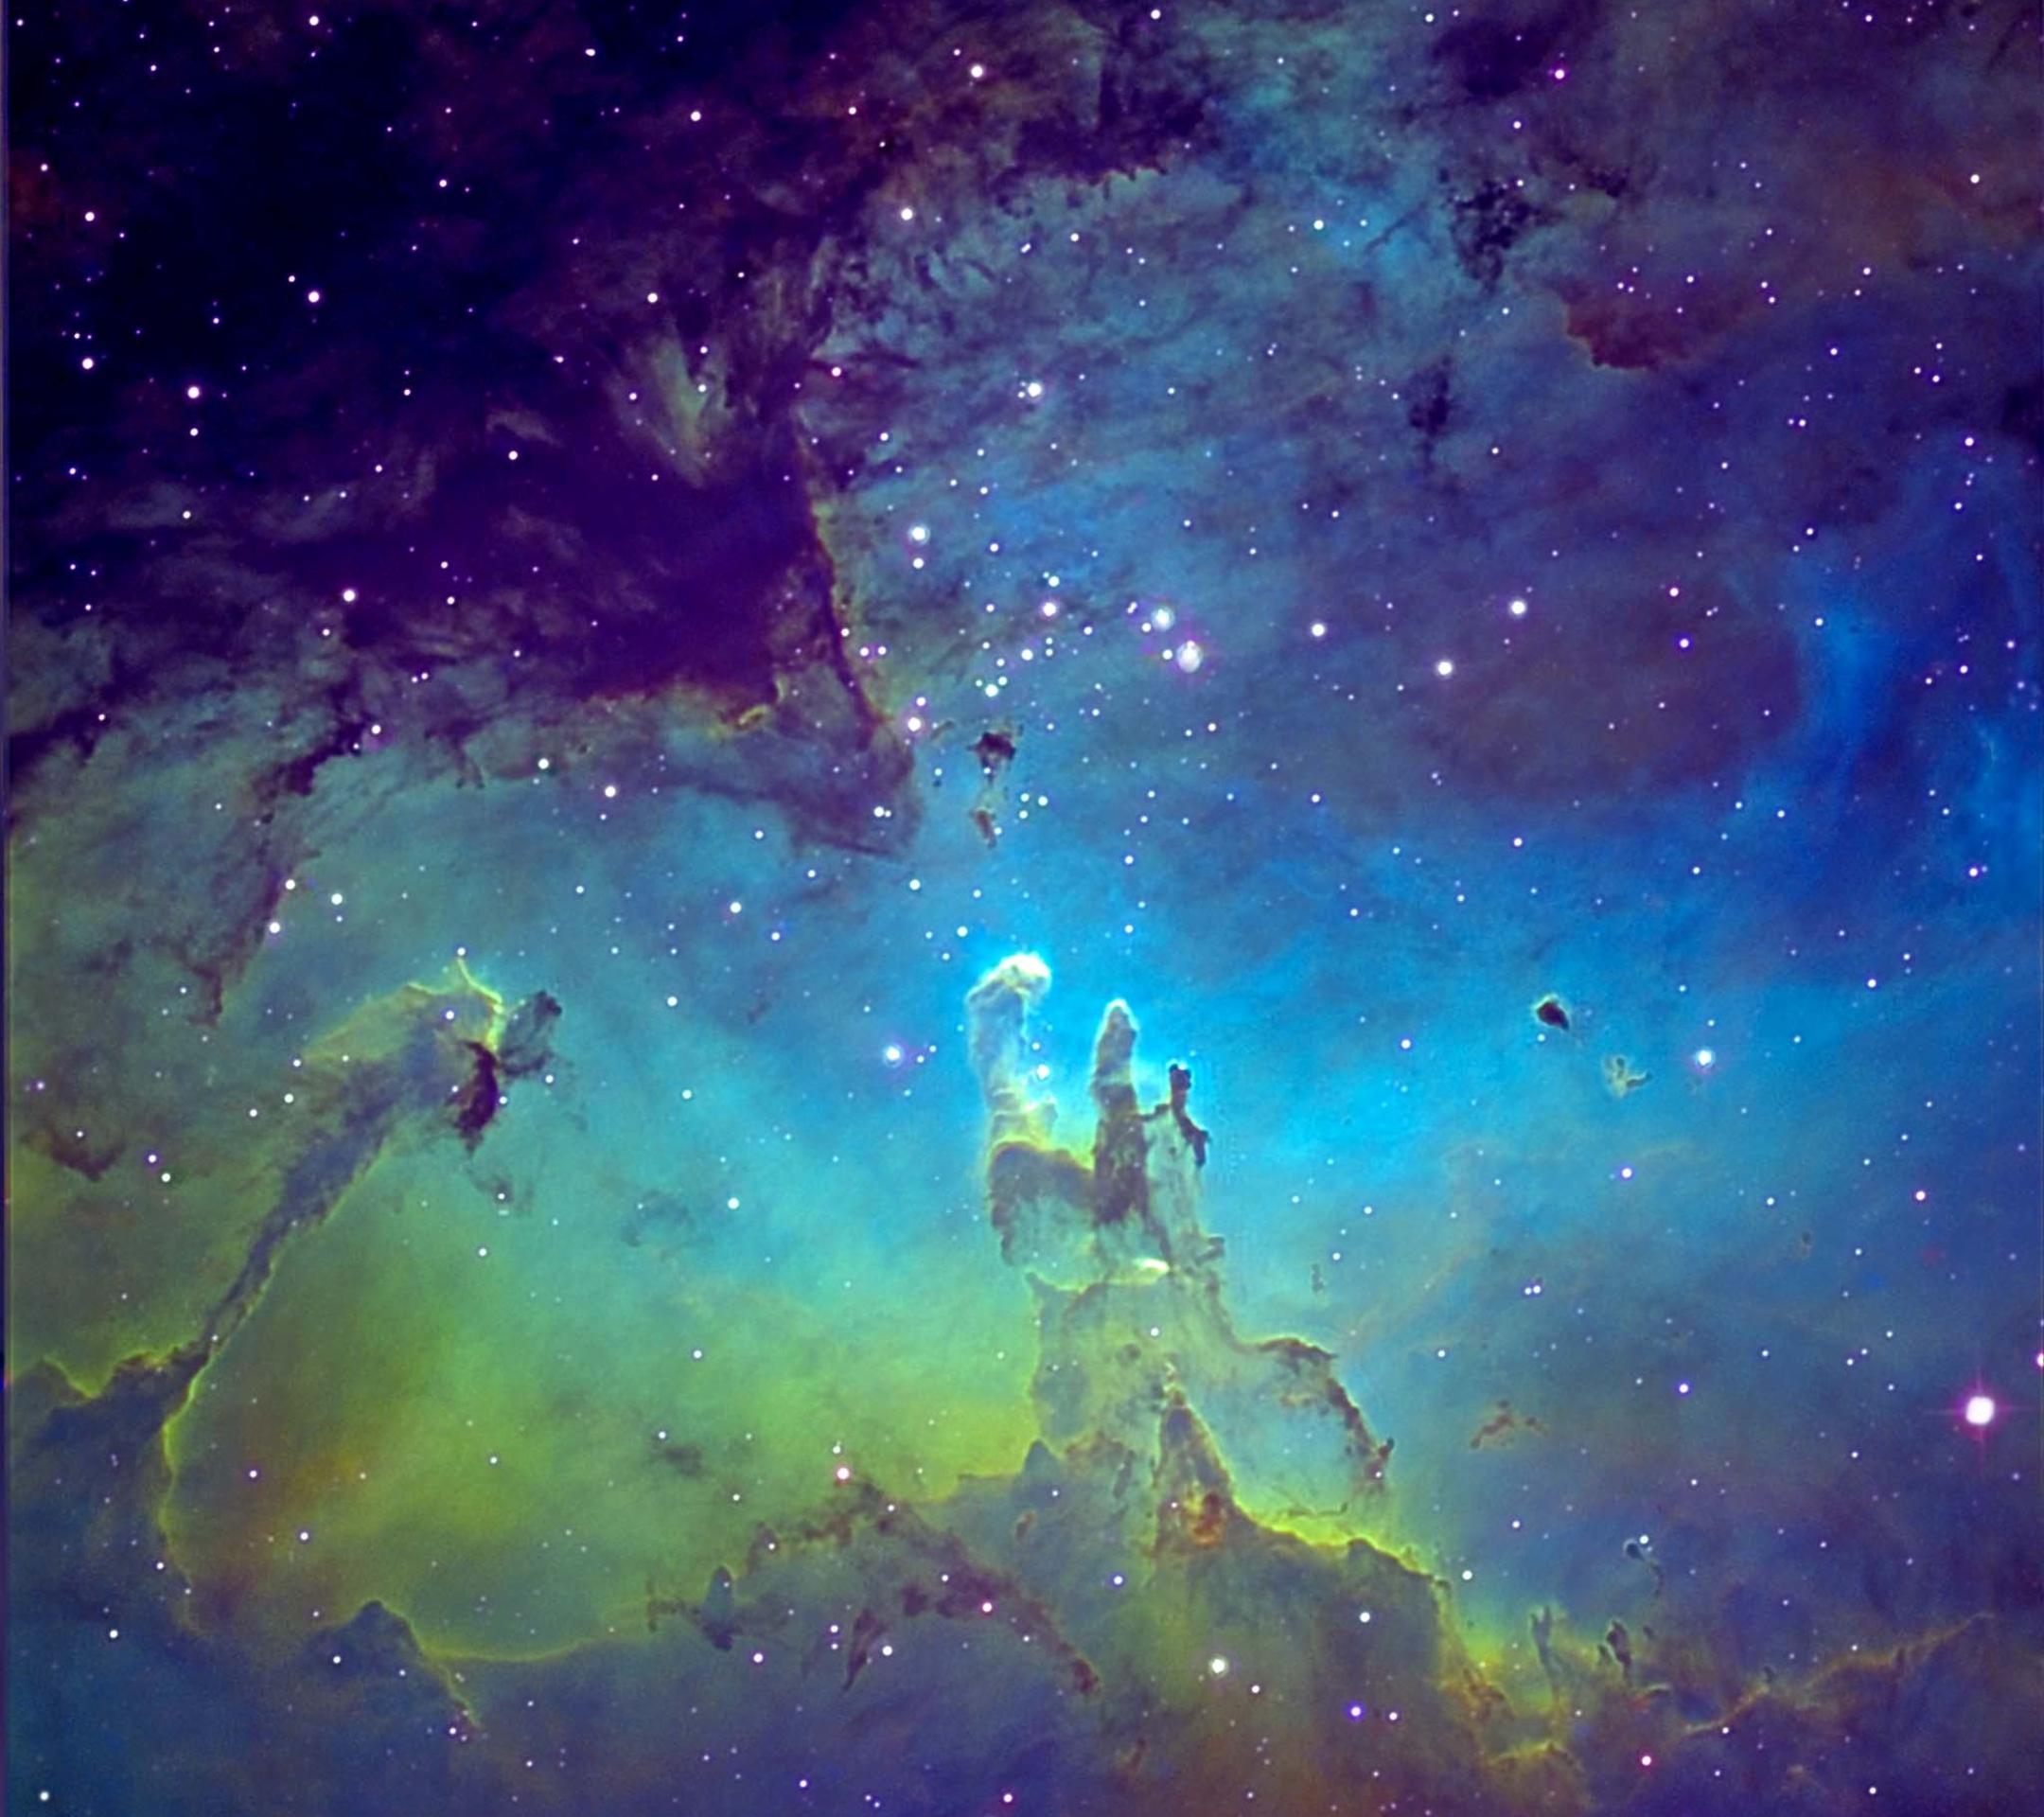 Hd wallpaper galaxy - Galaxy S4 Wallpapers Hd Beautiful Stunning Wallpapers